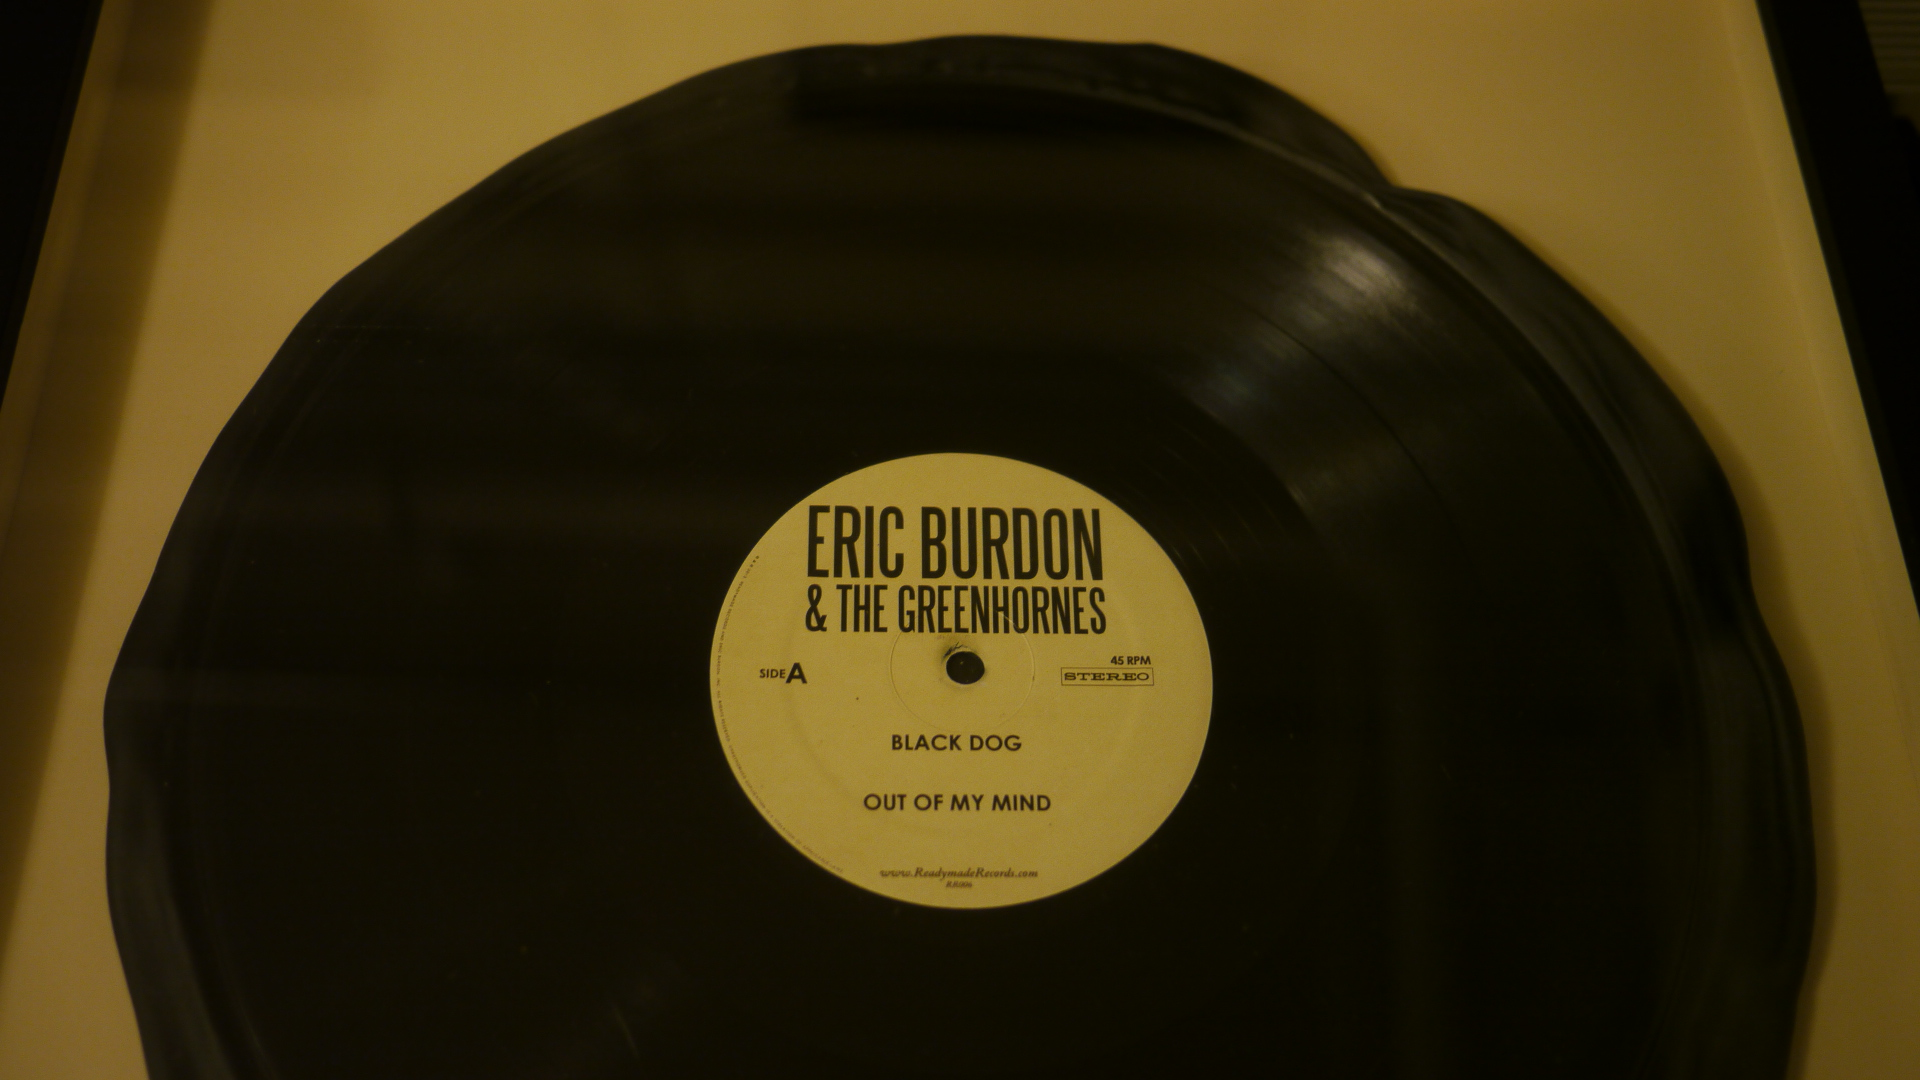 vinyl production record